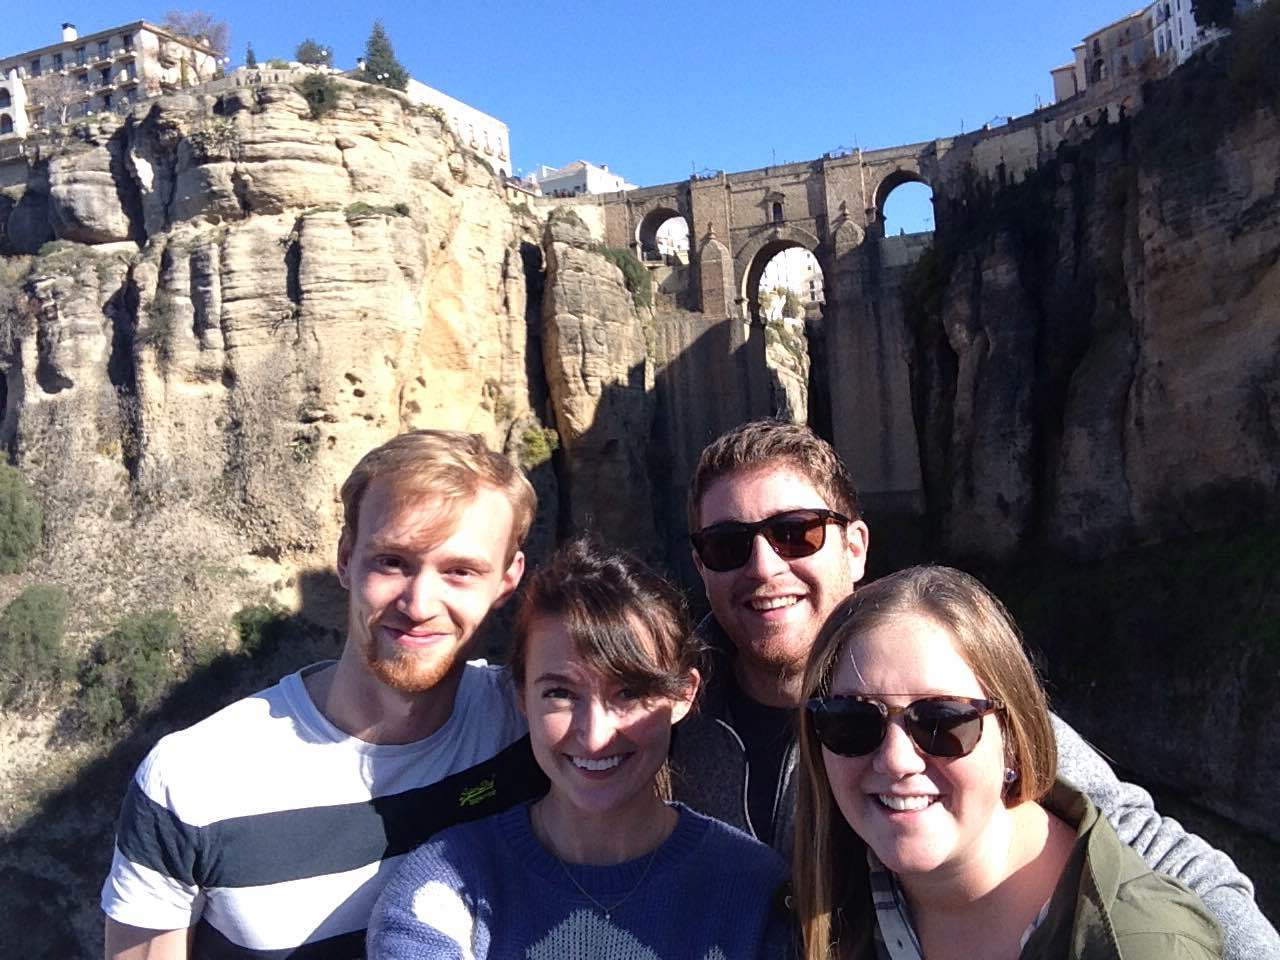 The best road trip crew! Sam, me, Julio, and Alexa